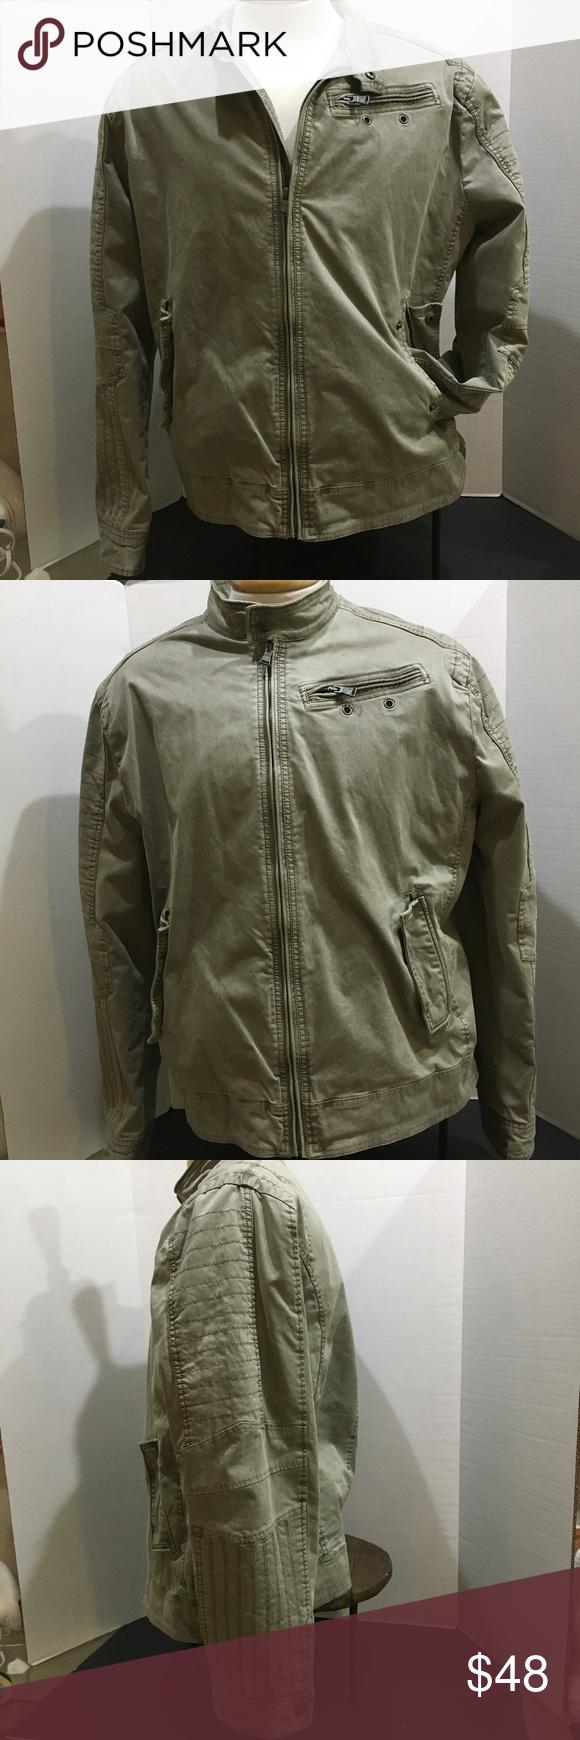 Men S Cotton Bomber Jacket By Express Size Xl Bomber Jacket Bomber Jacket Men Jackets [ 1740 x 580 Pixel ]